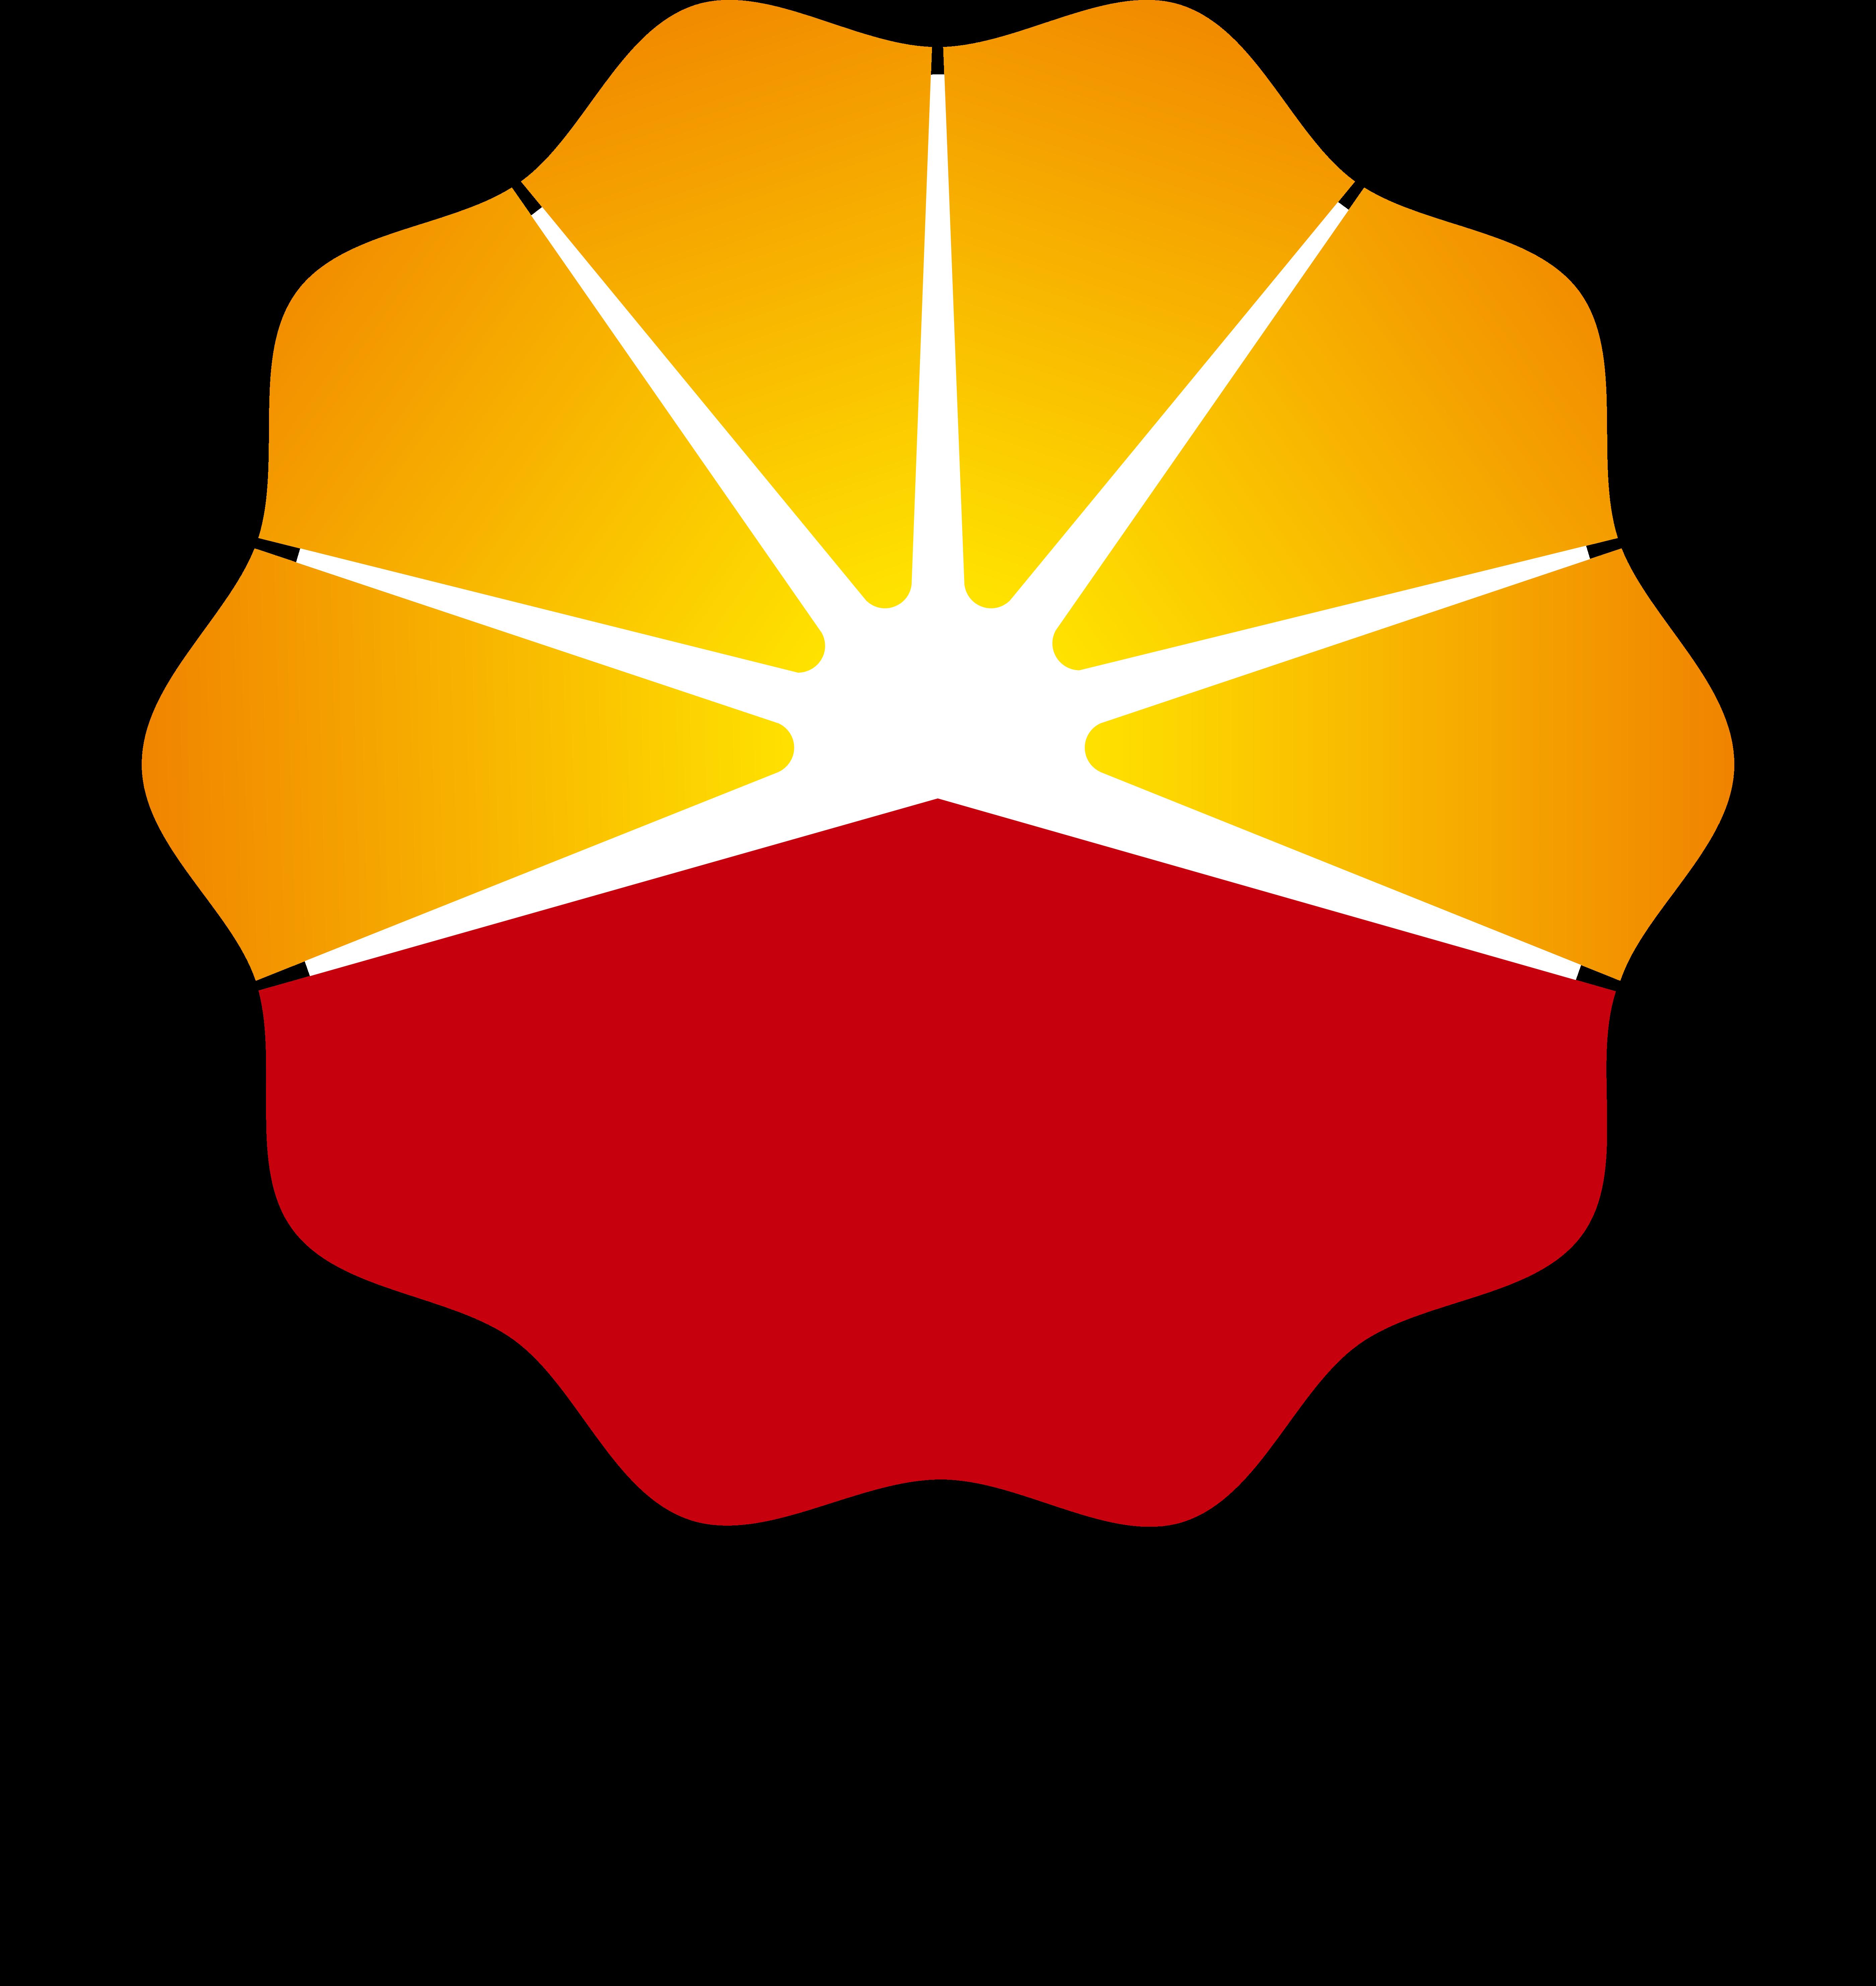 Petrochina Logo, Logotype, Emblem - Petrochina, Transparent background PNG HD thumbnail